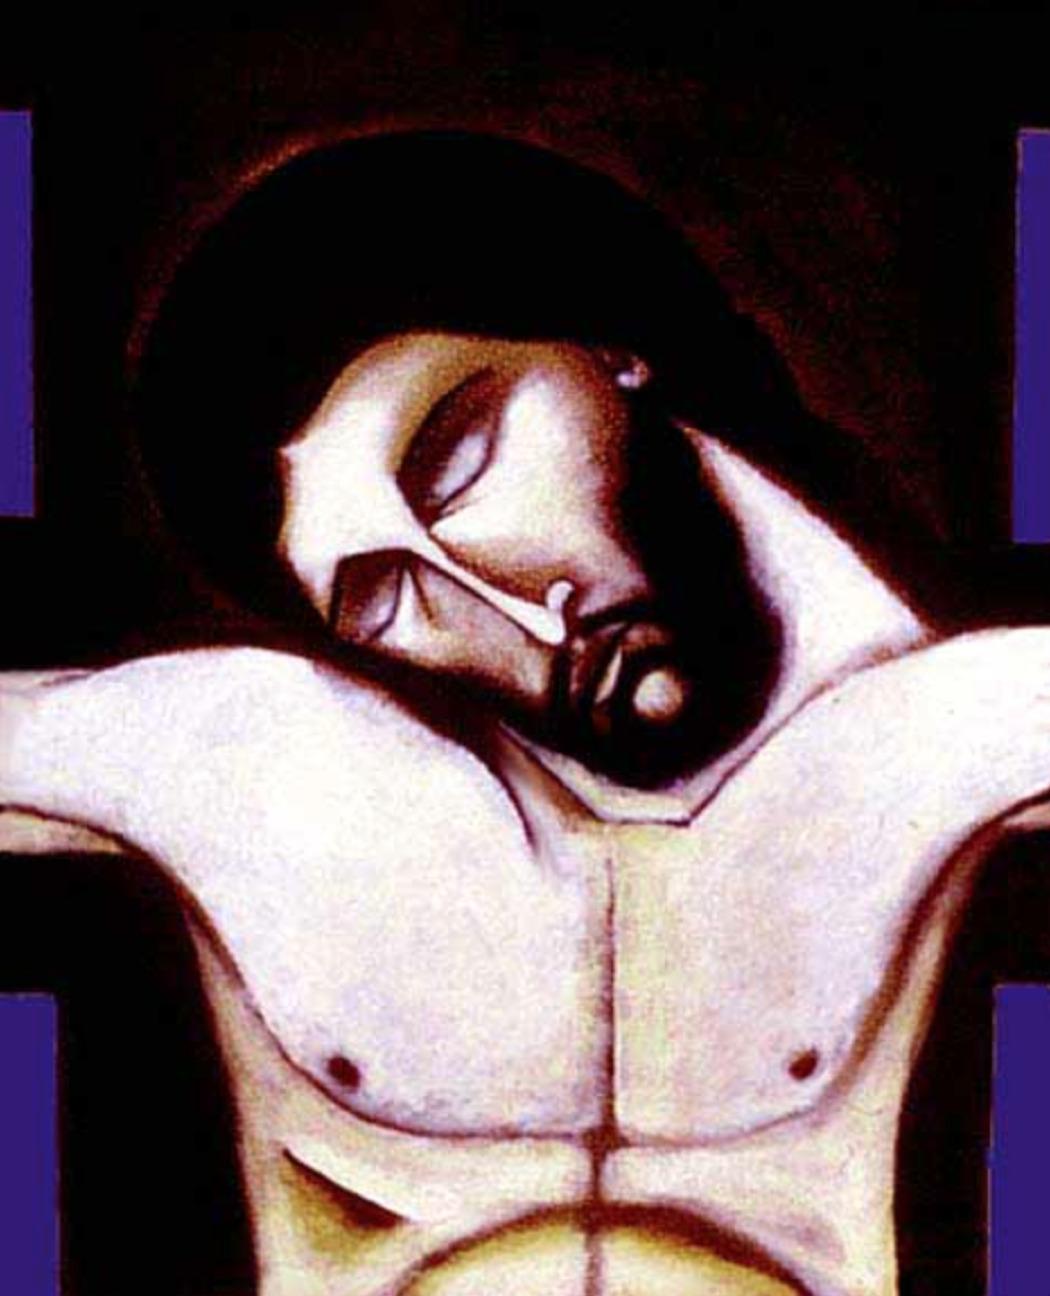 Christ's Crucifixion, by Michael D. O'Brien